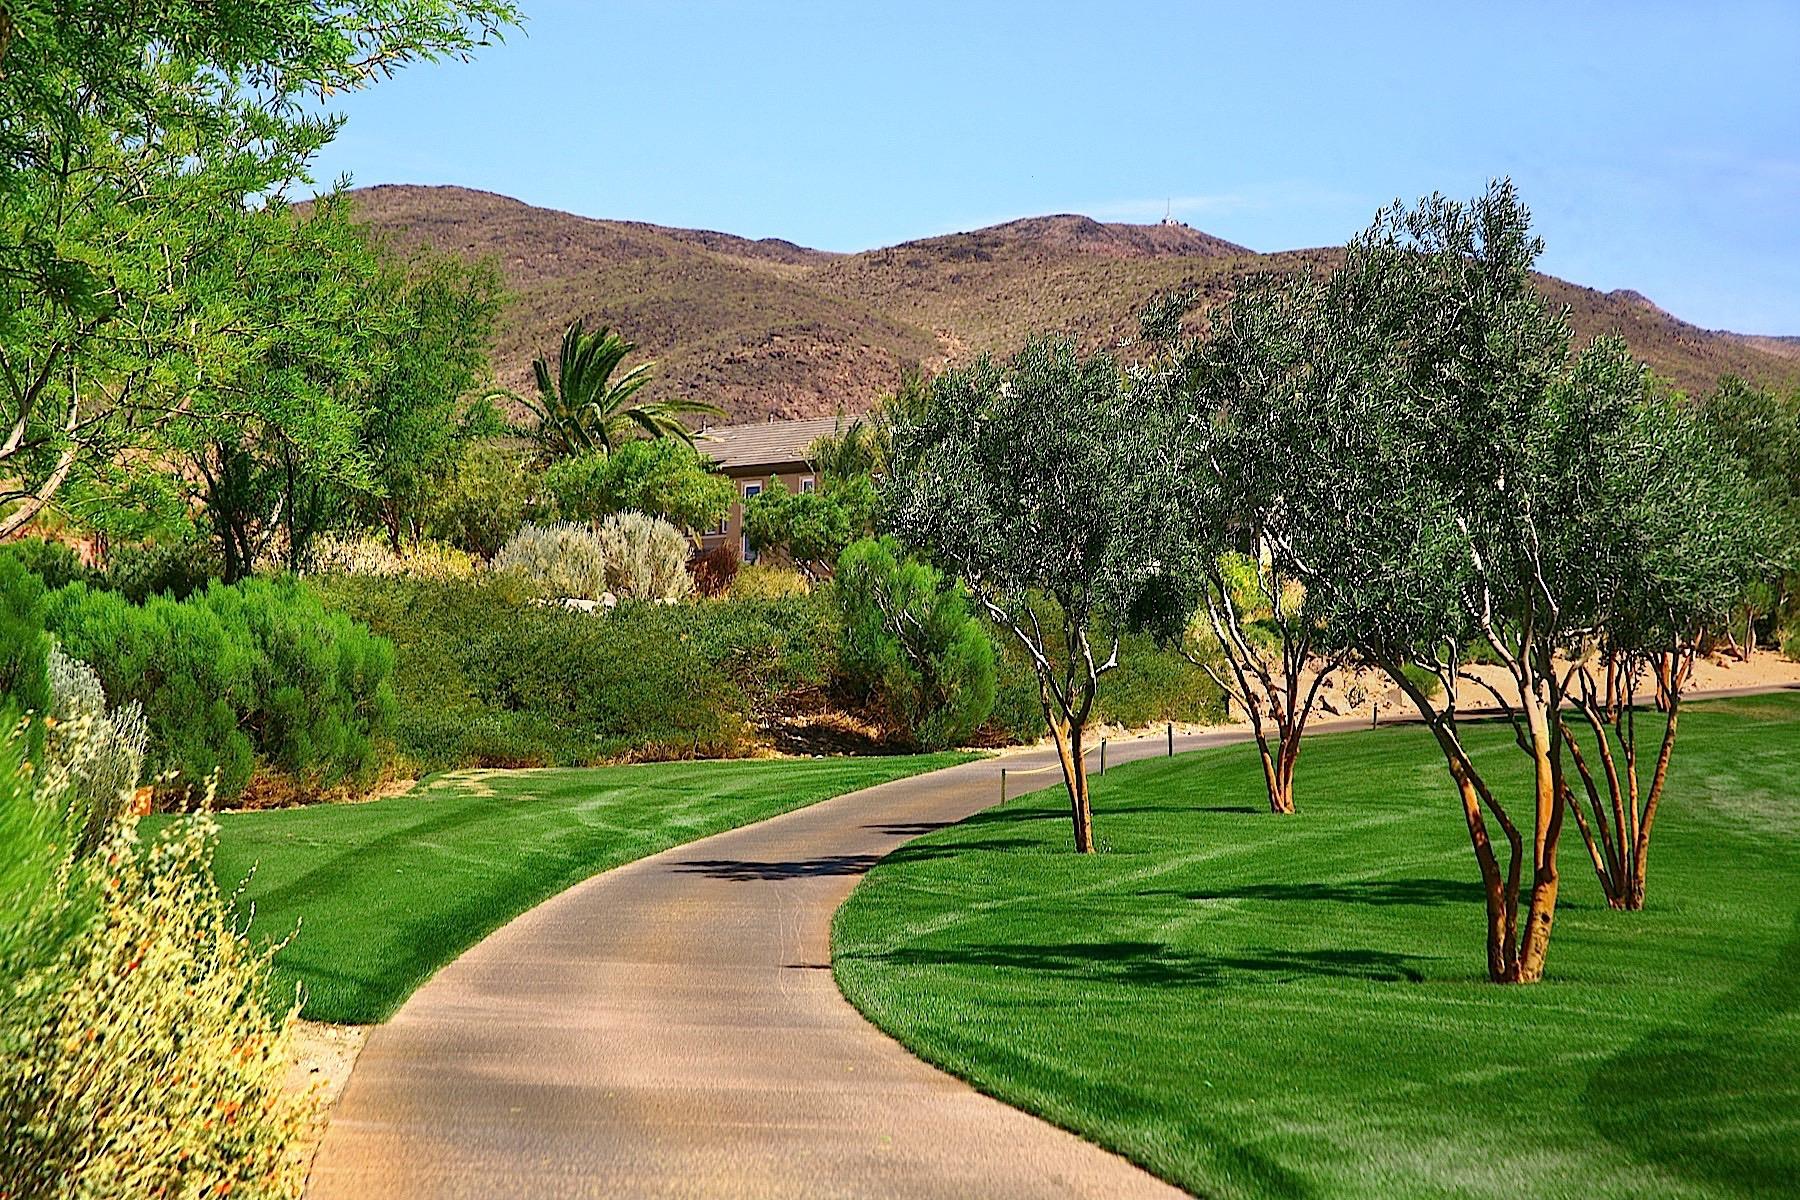 Additional photo for property listing at 689 Dragon Peak Dr 689 Dragon Peak Dr Henderson, Nevada 89012 United States